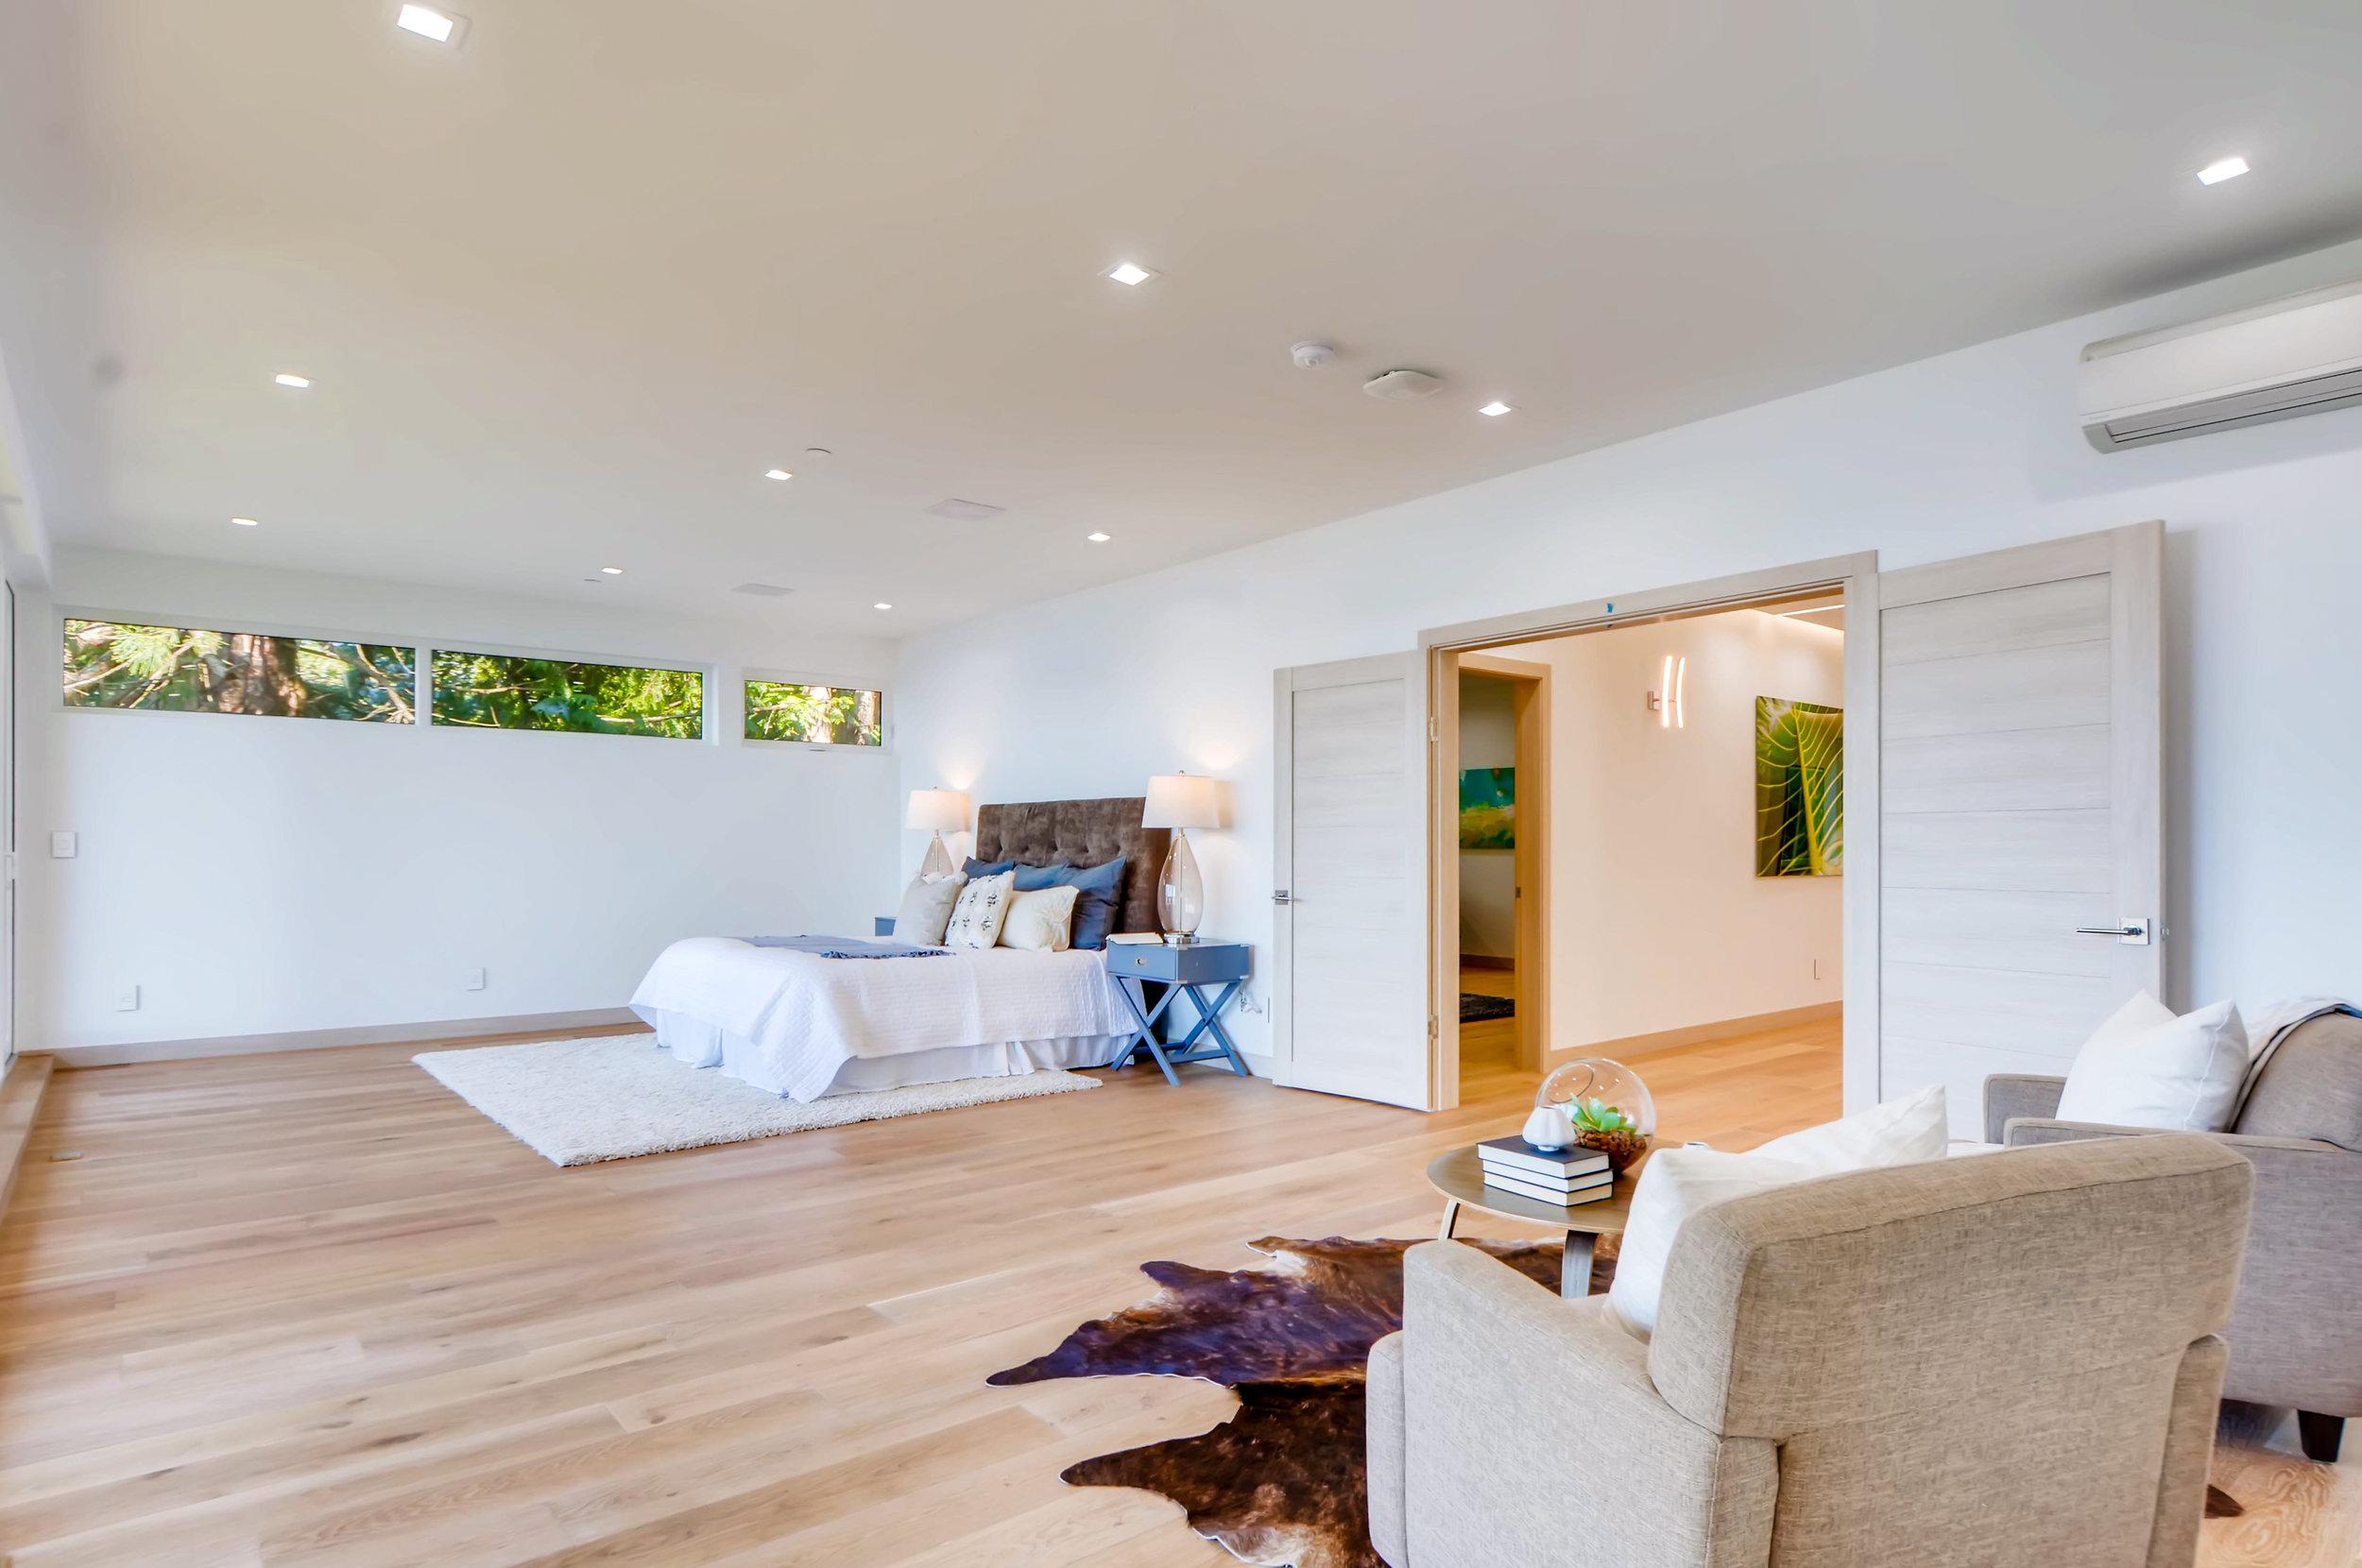 12410 Holmes Point Drive NE-print-020-18-2nd Floor Master Bedroom-4200x2790-300dpi.jpg